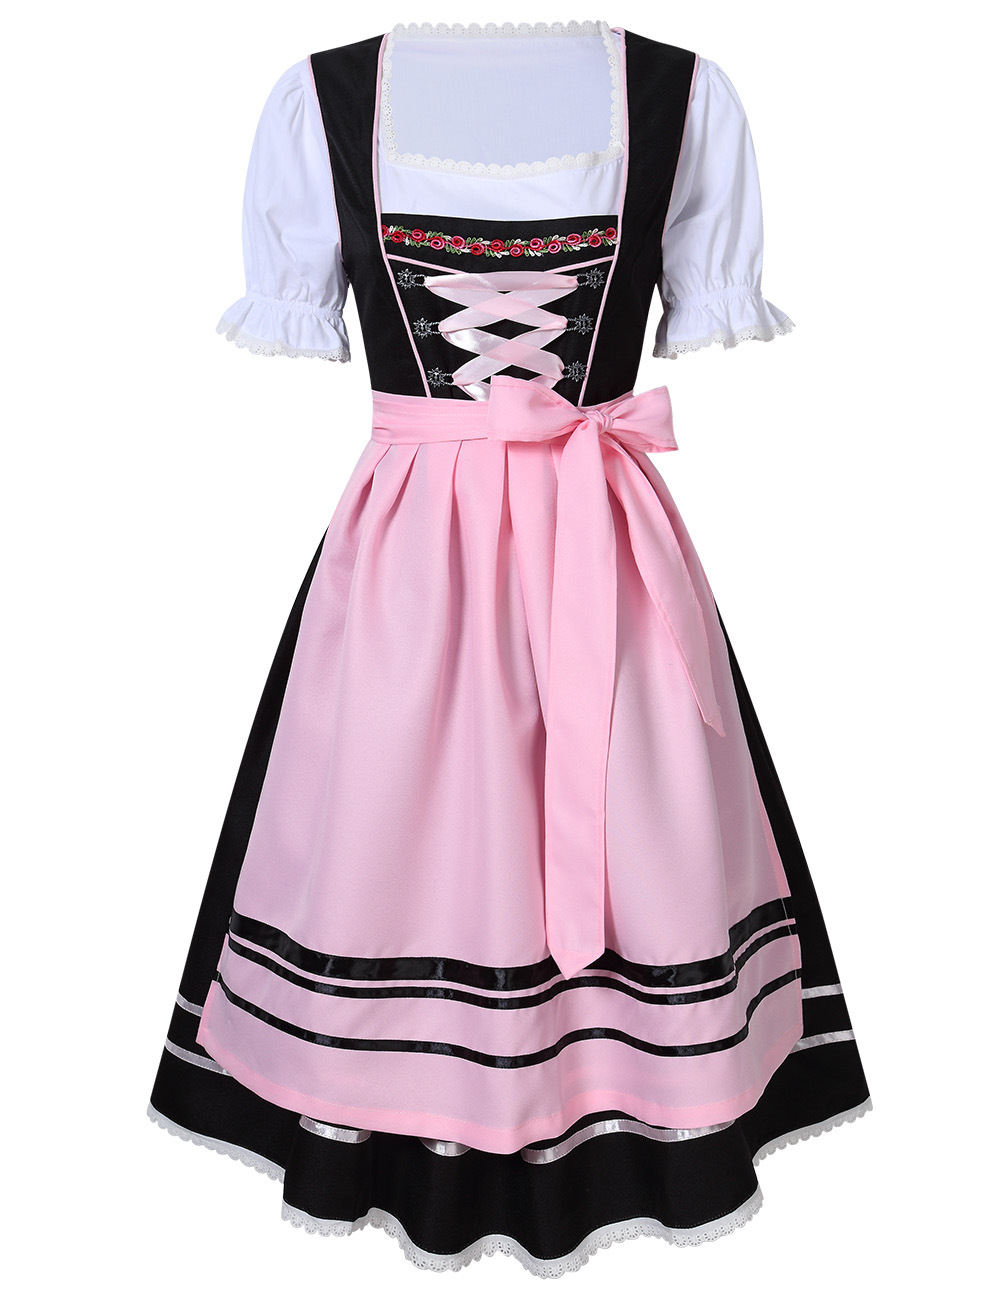 Female Bavarian Traditional Dirndl Dress Fastening Ties for Beer Festival  Pink/black_M